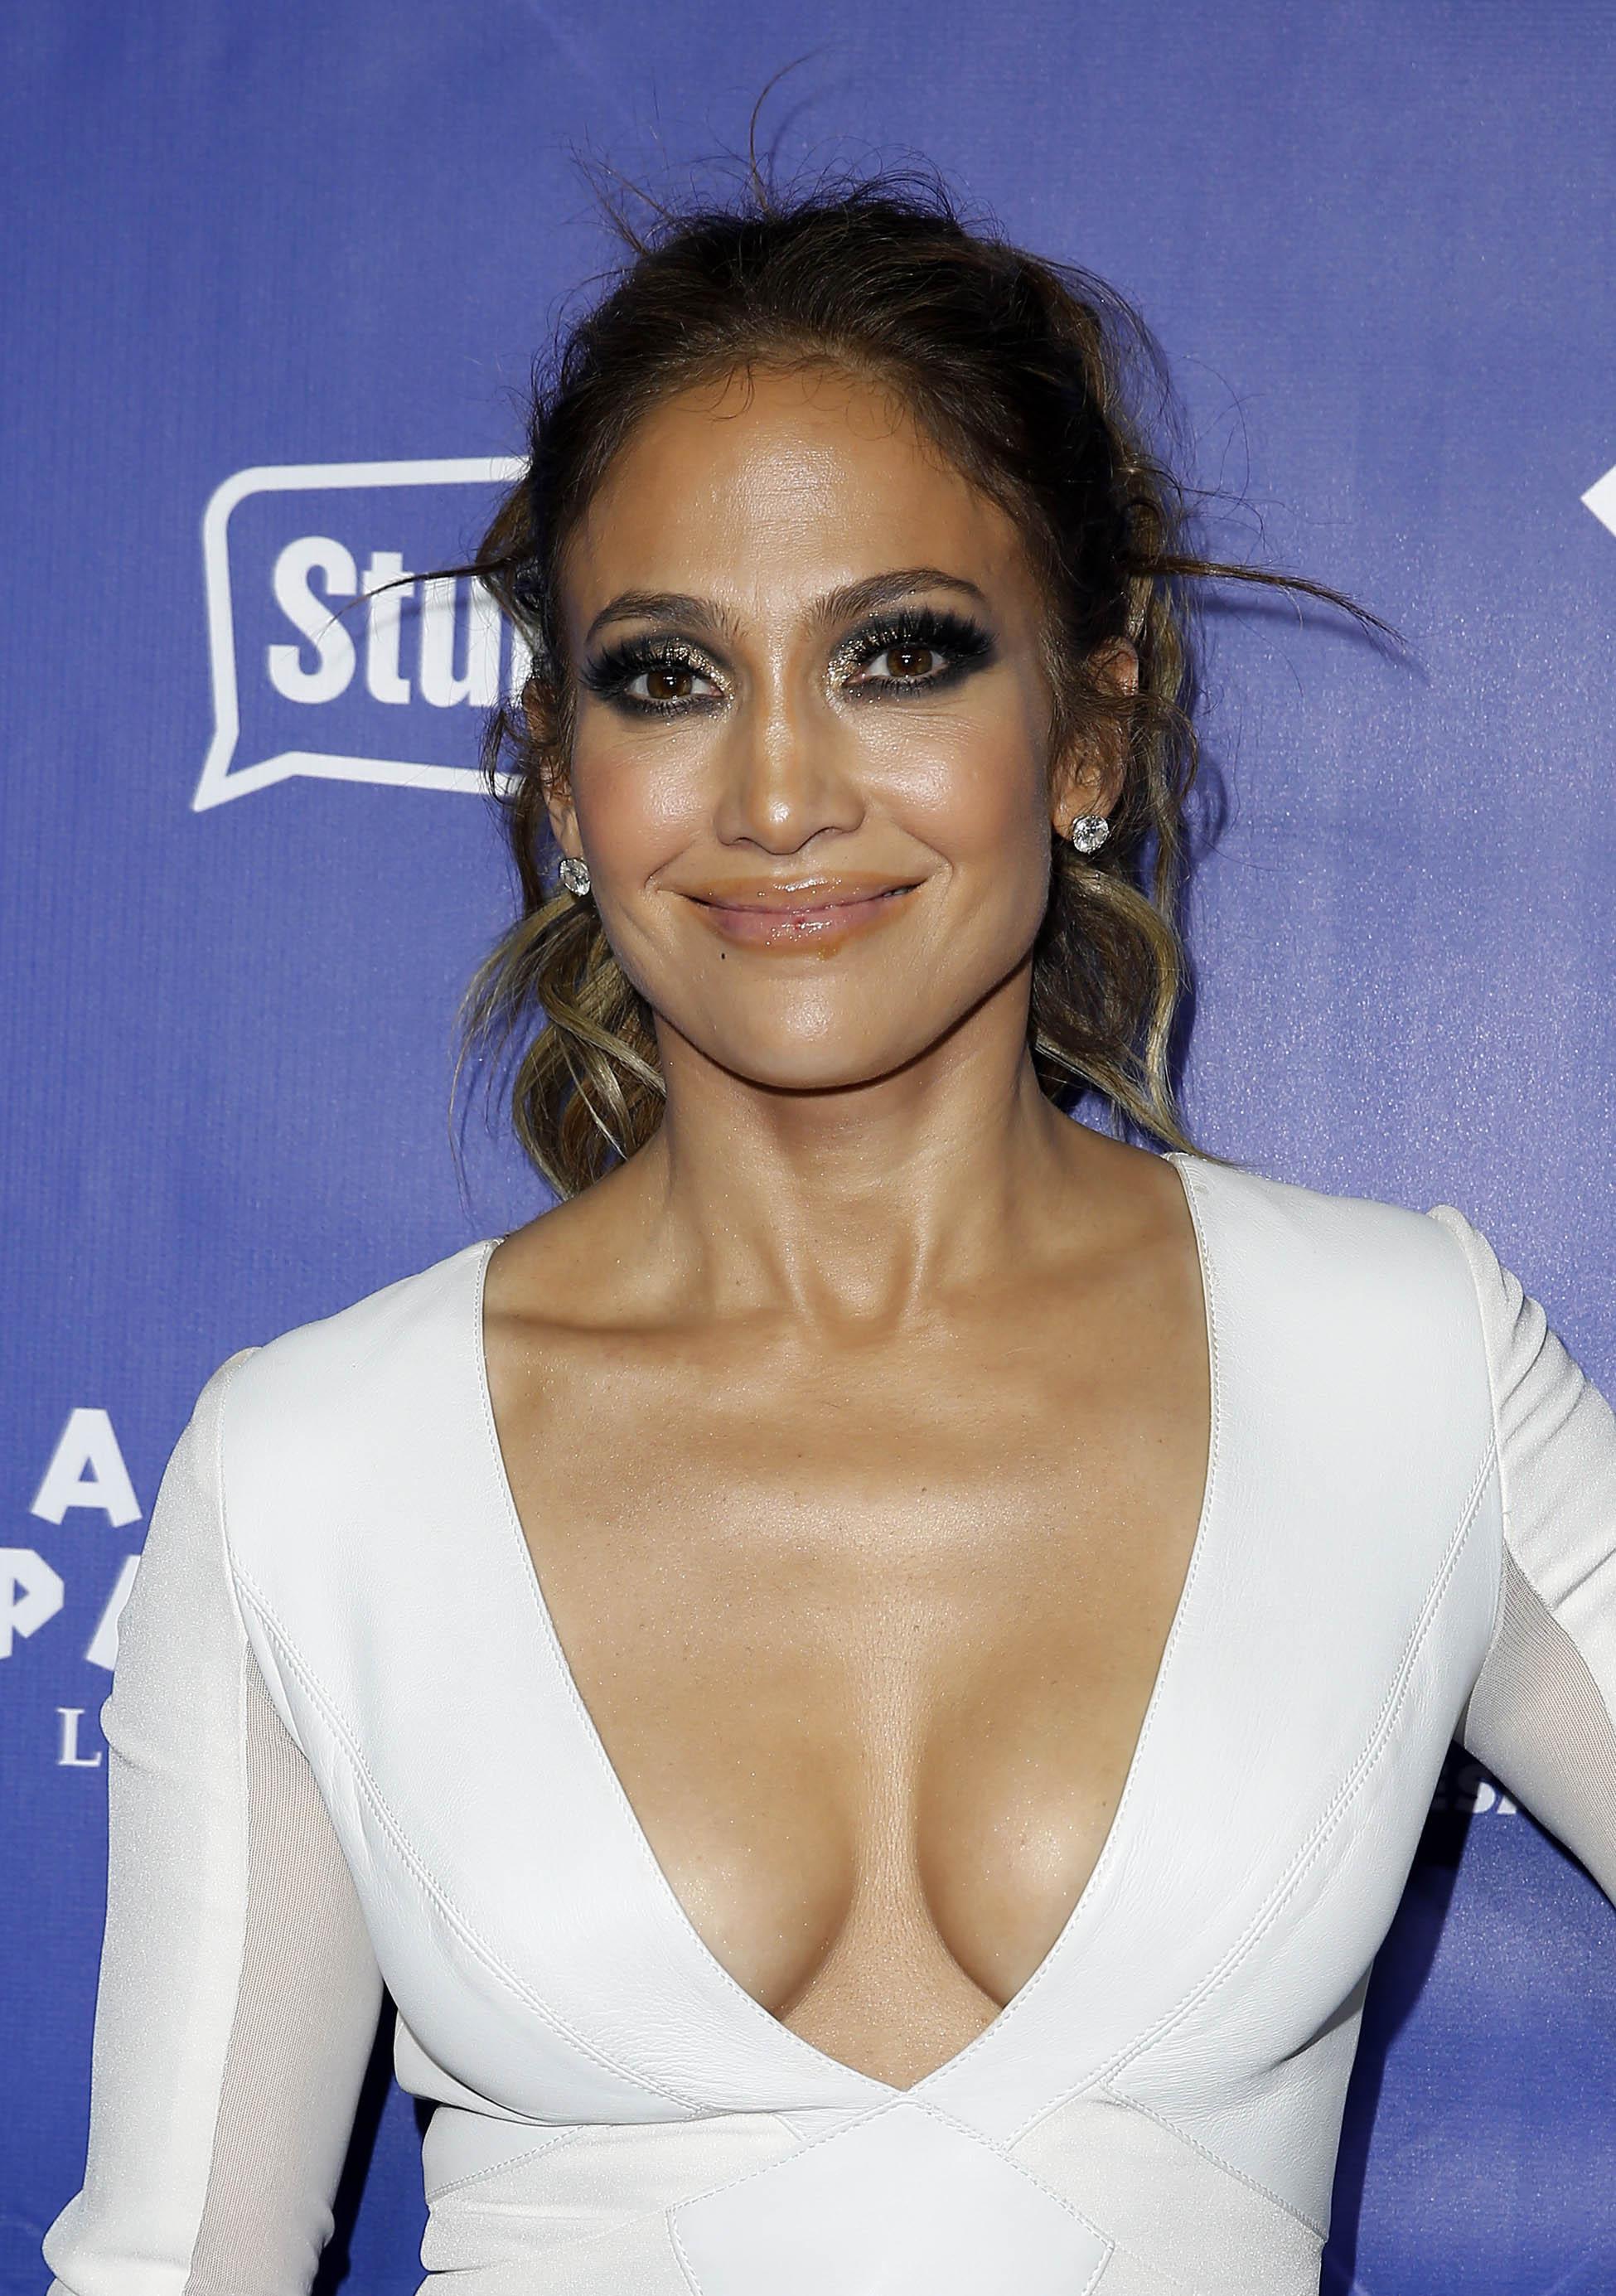 Jennifer Lopez Deep Cleavage Selfie Video - NuCelebs.com